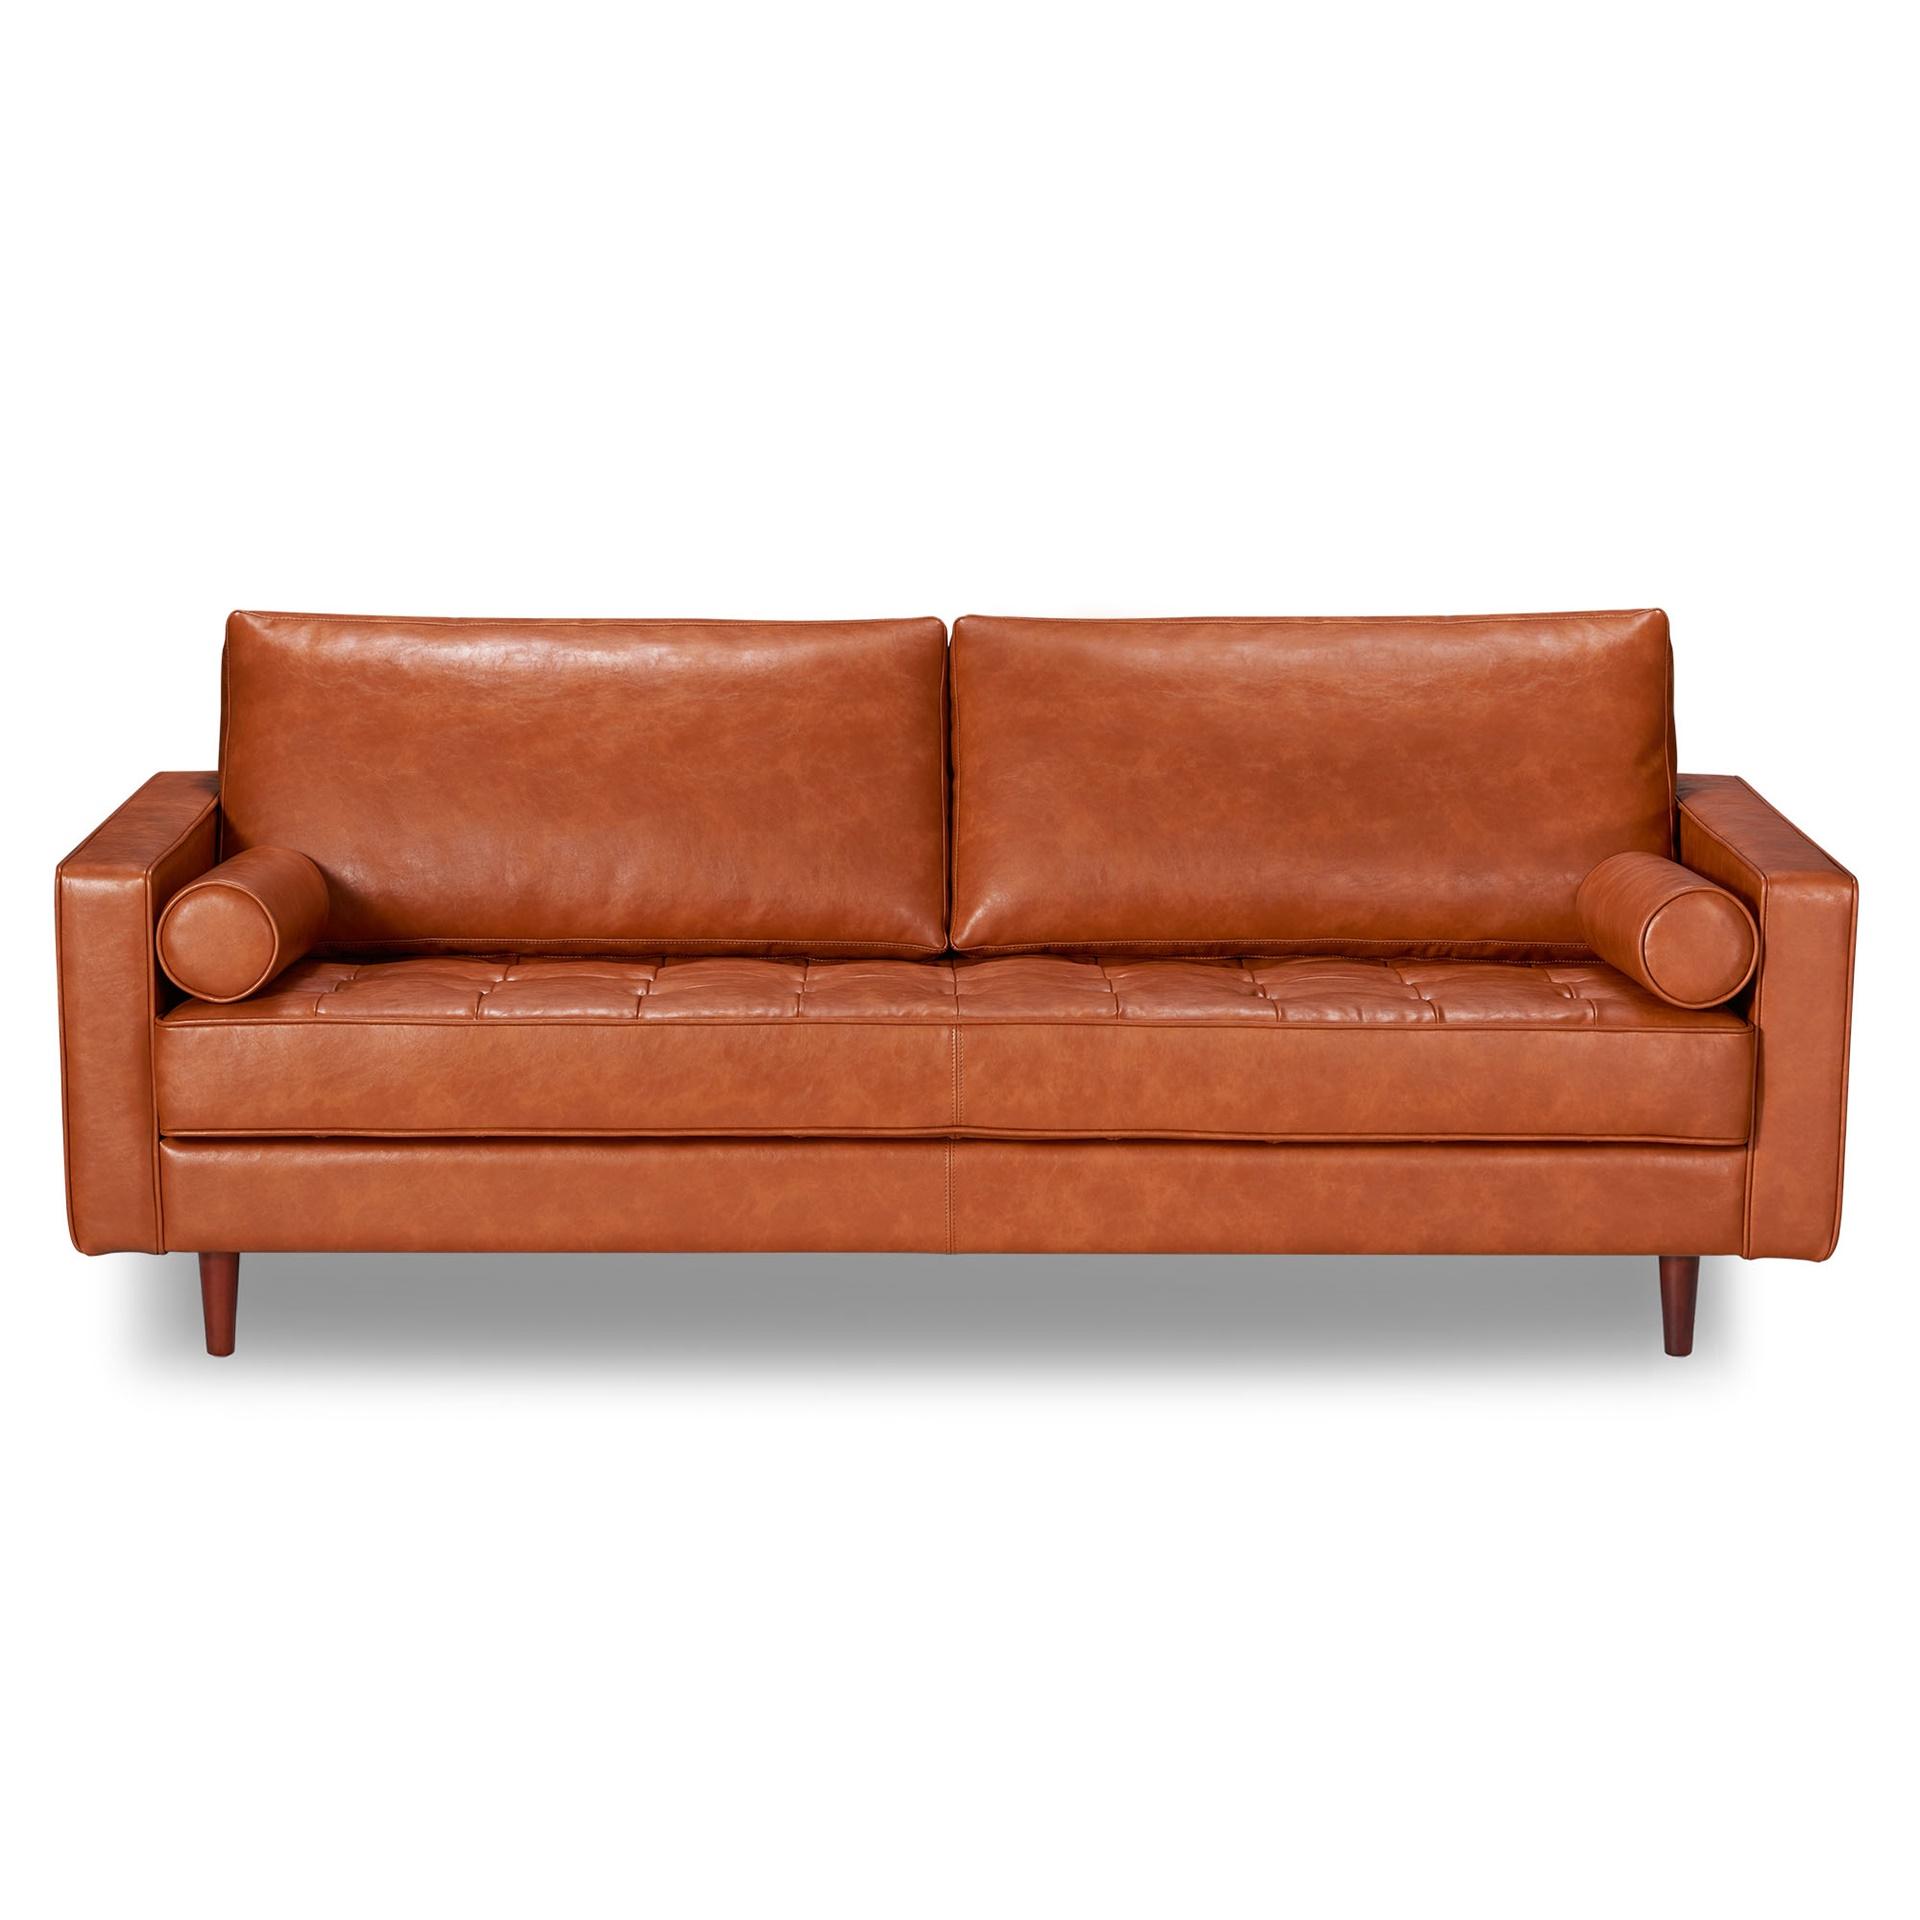 Amazing Ashton Vintage Leather Sofa Creativecarmelina Interior Chair Design Creativecarmelinacom